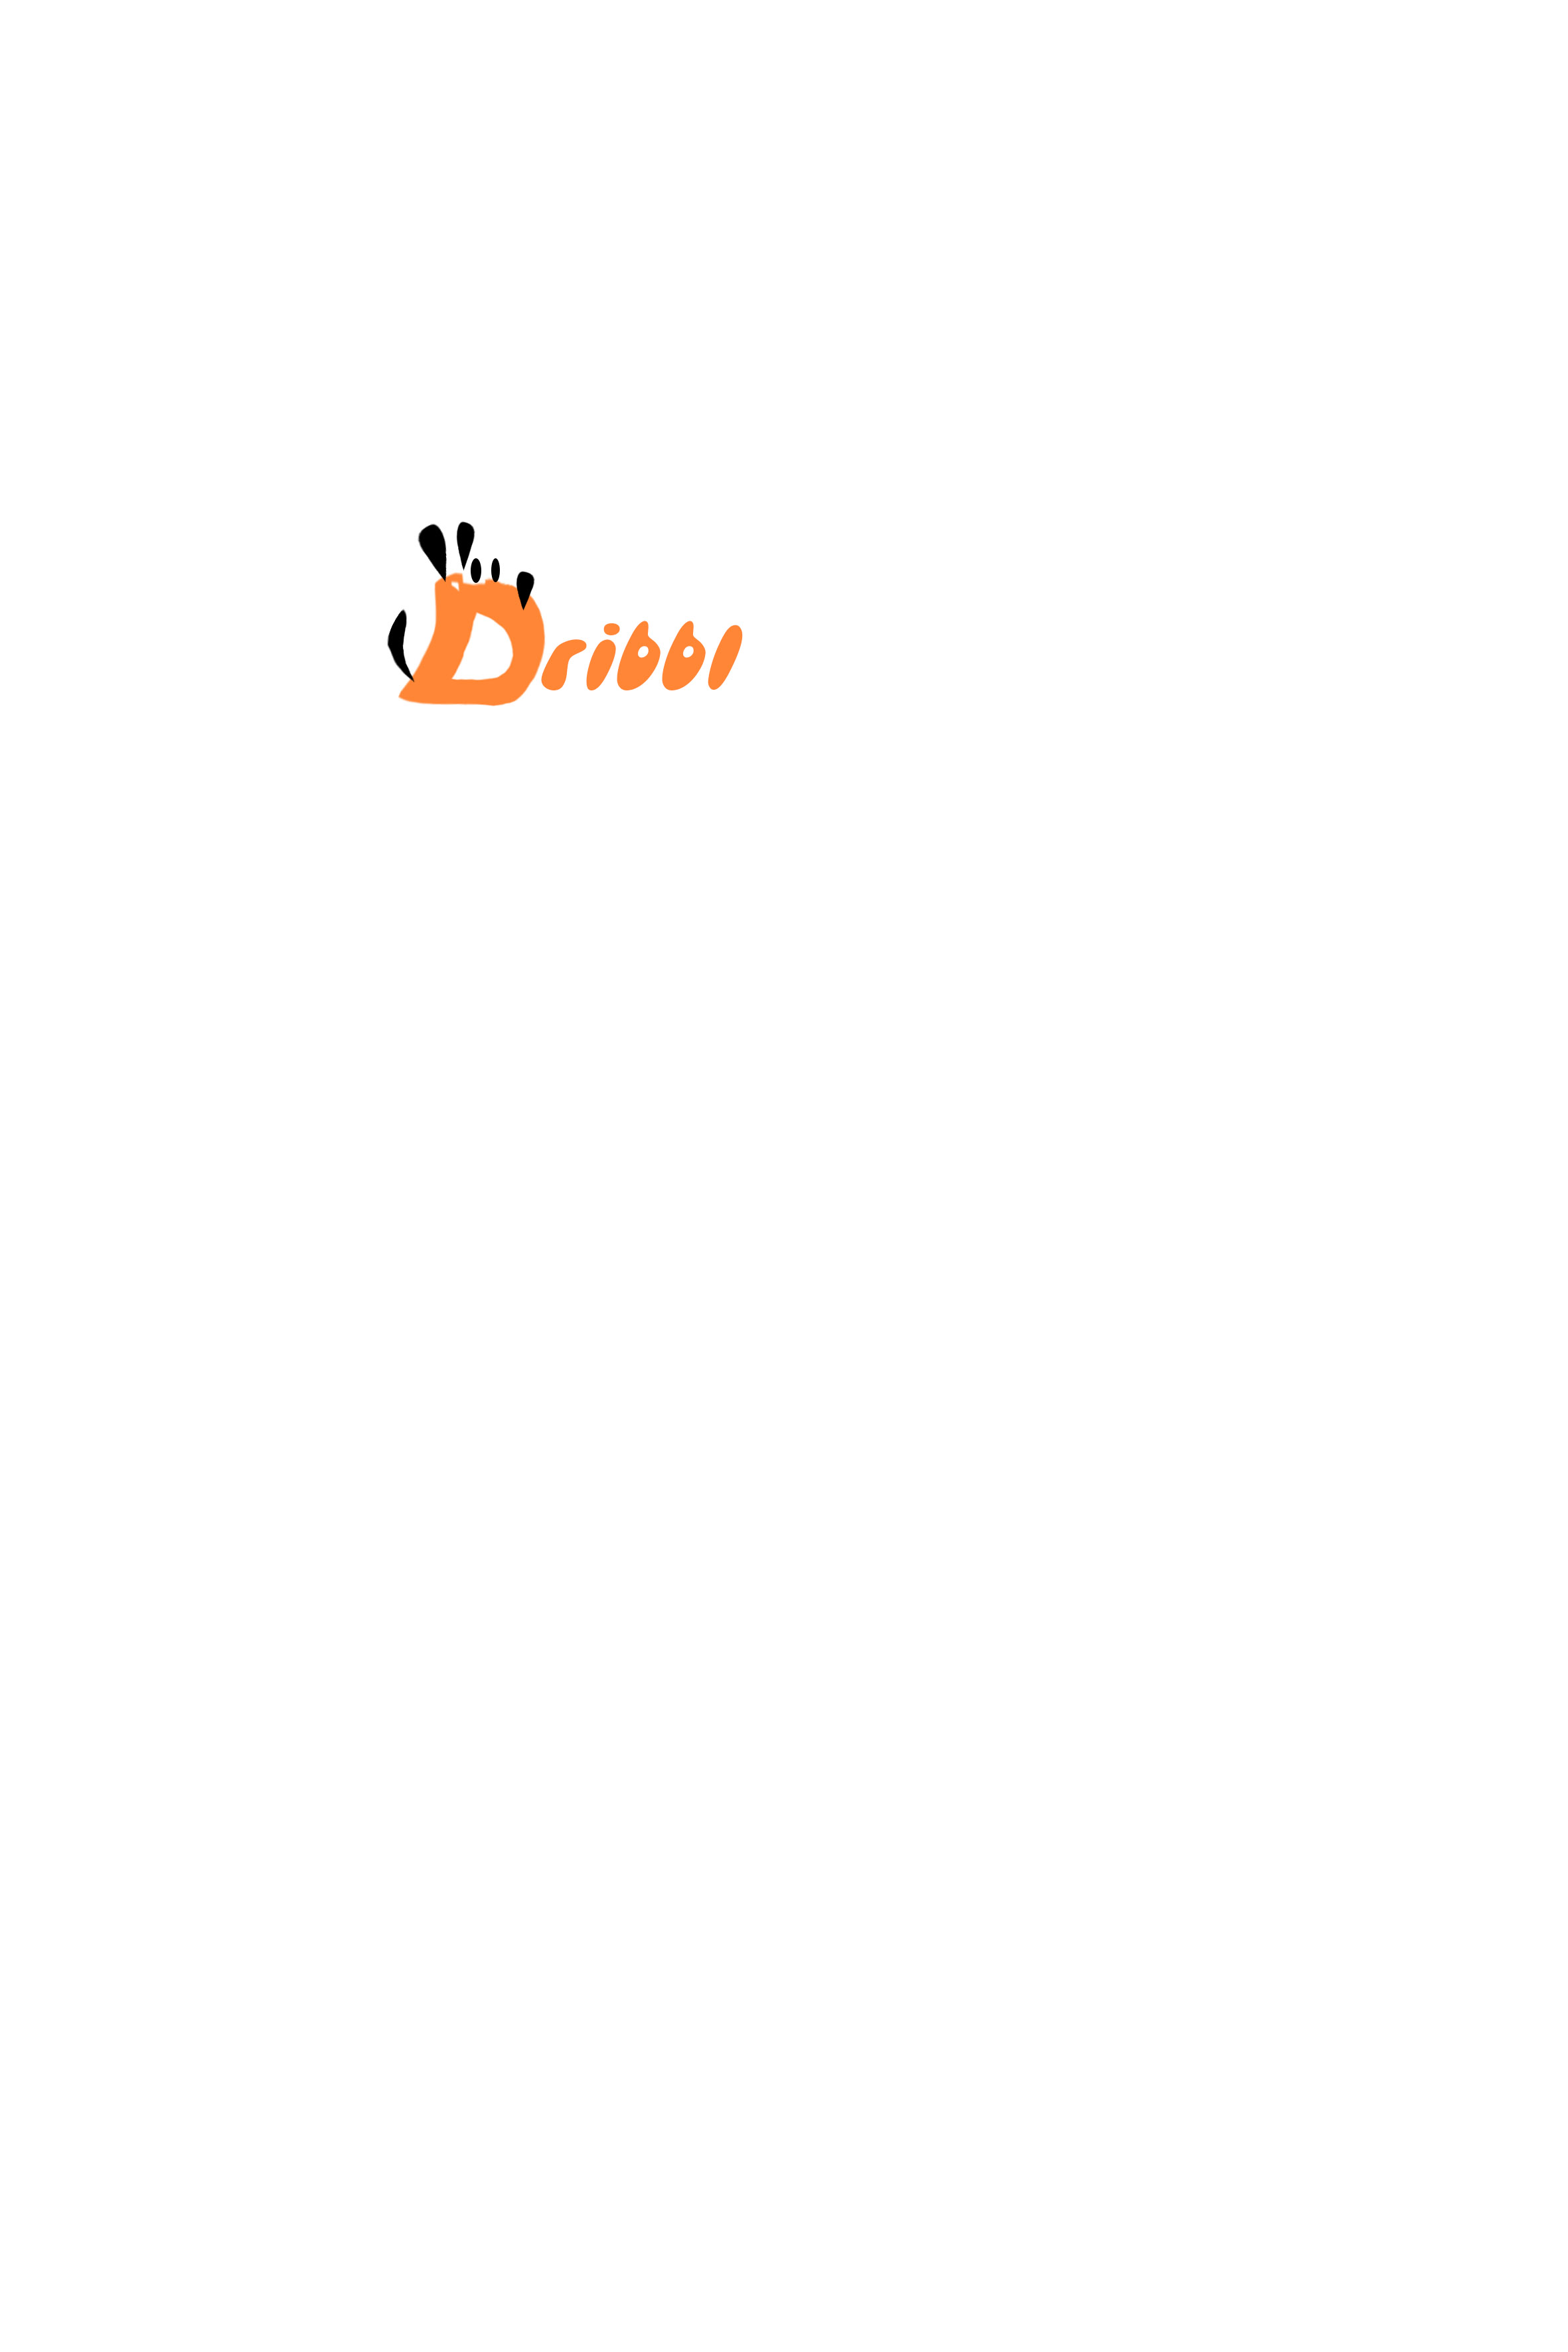 Разработка логотипа для сайта Dribbl.ru фото f_1825a9c0d5cb12af.jpg